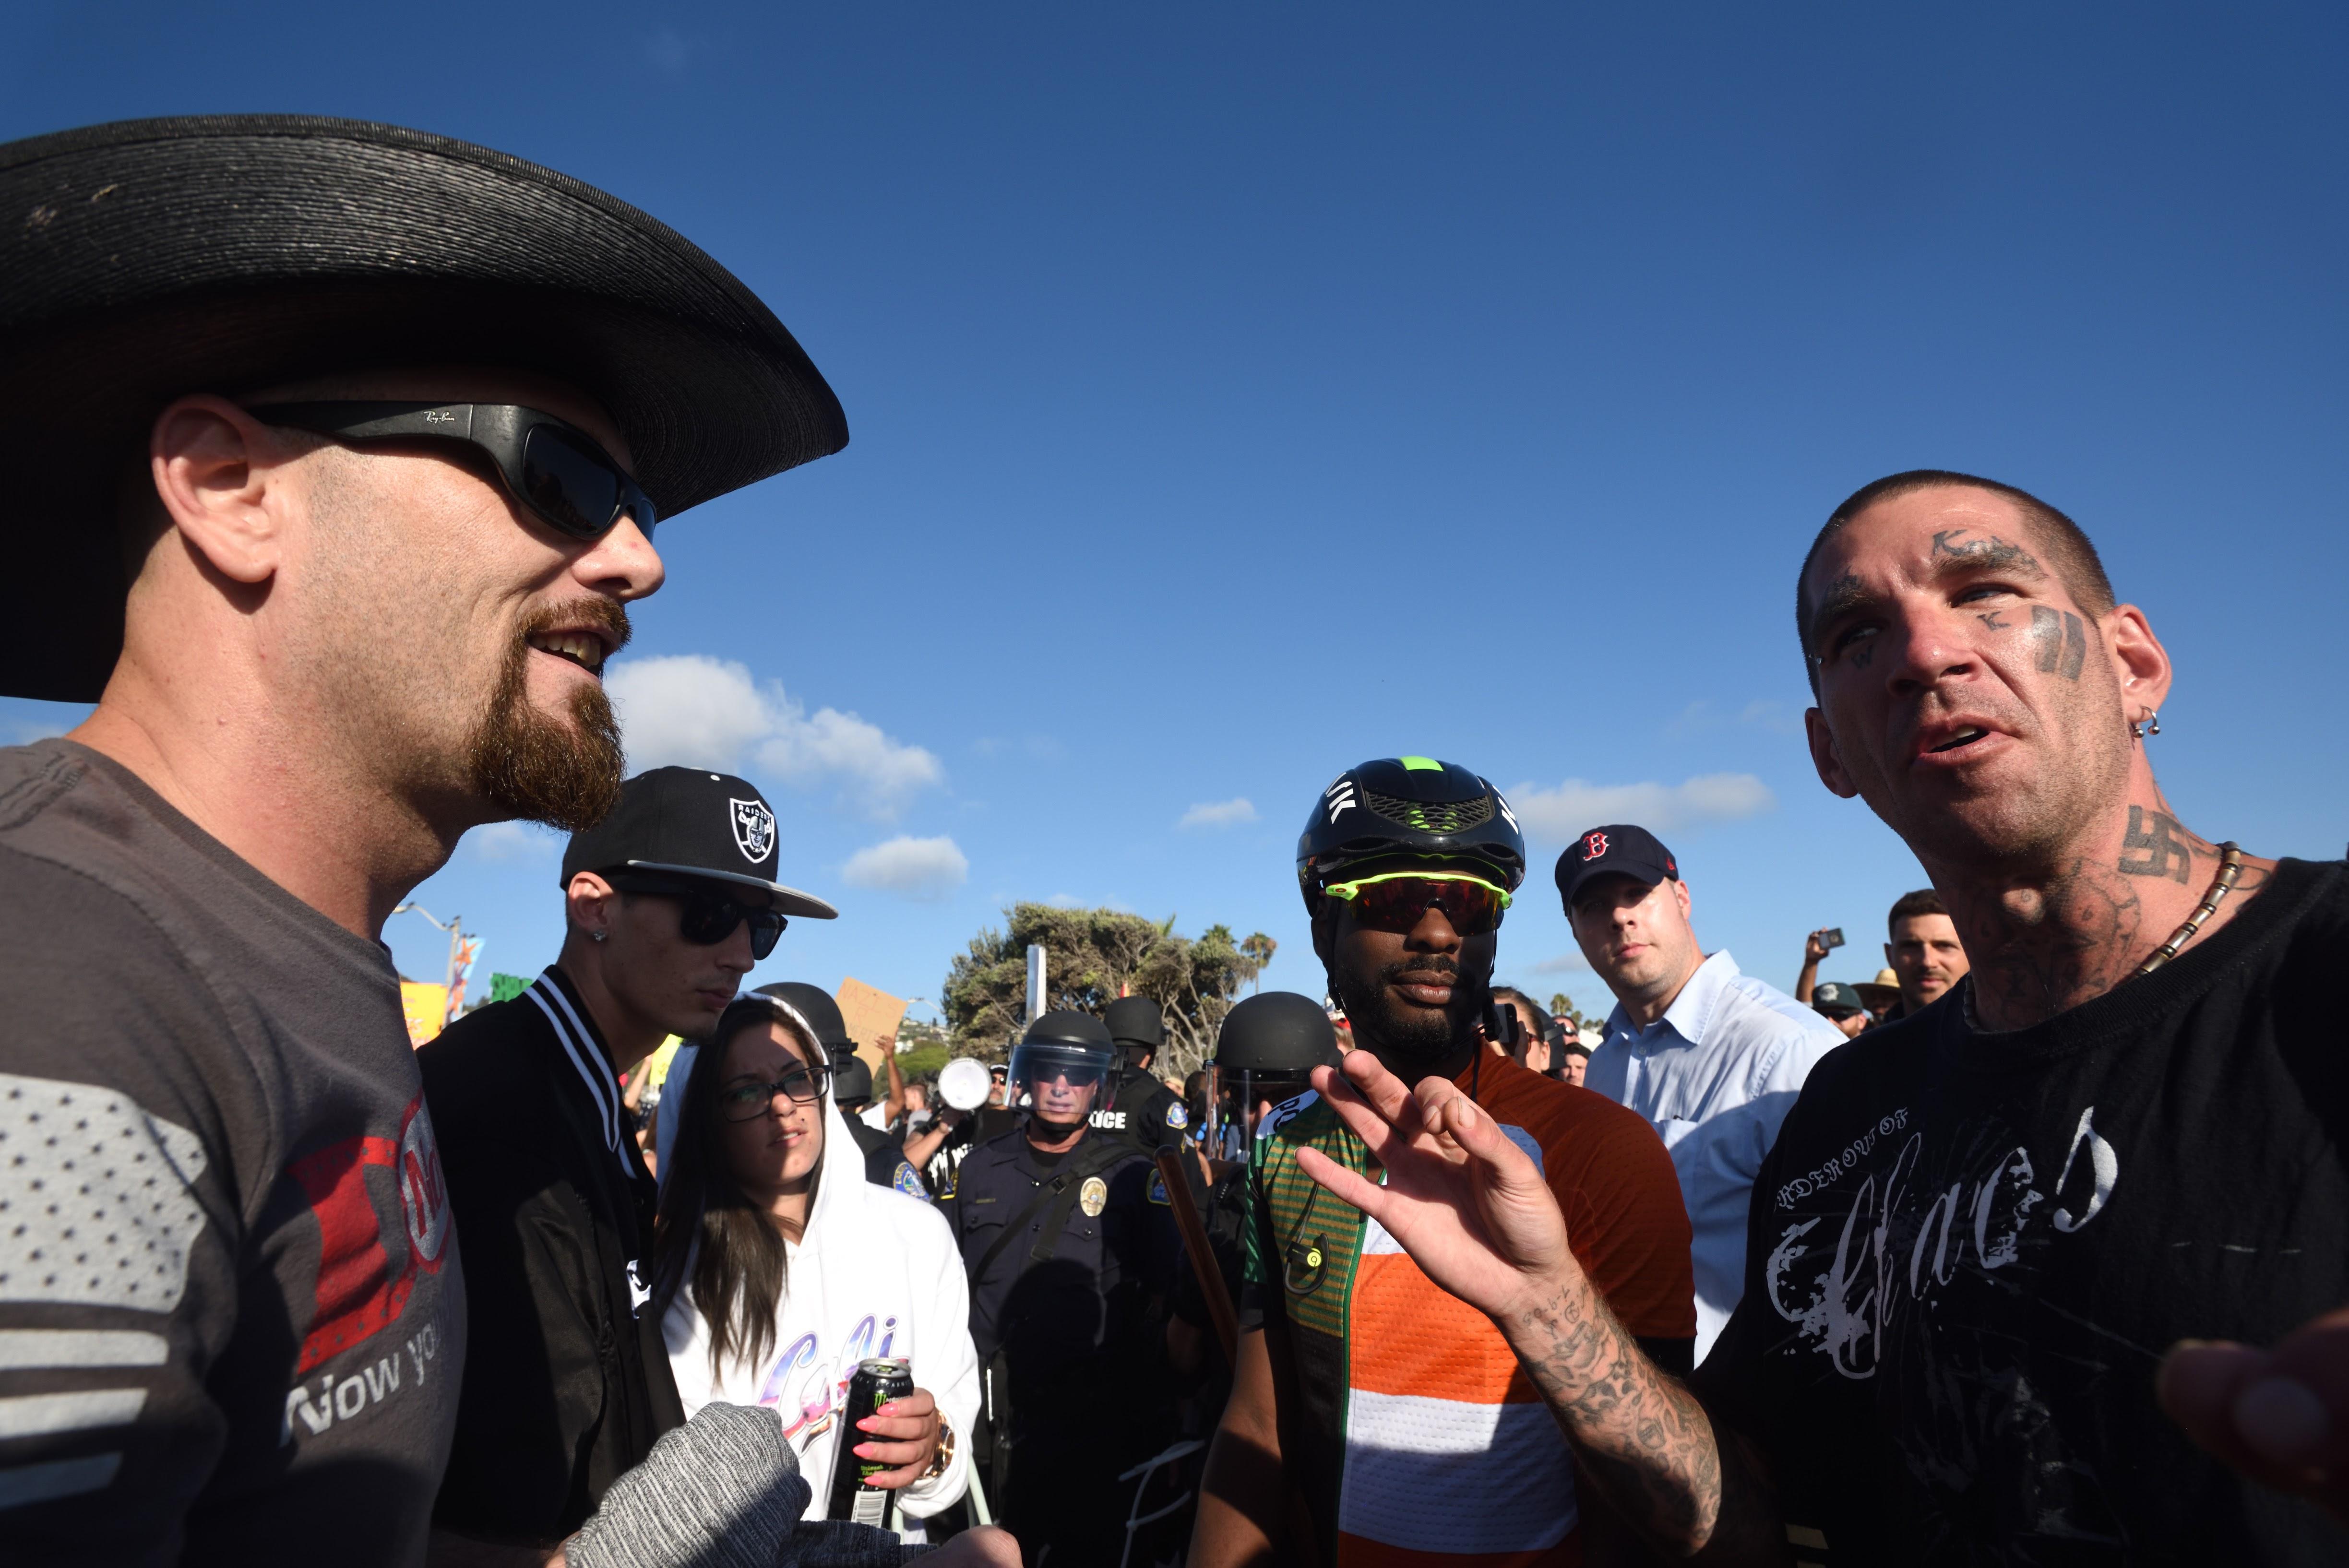 Alt Right Rally In Laguna Beach Ca